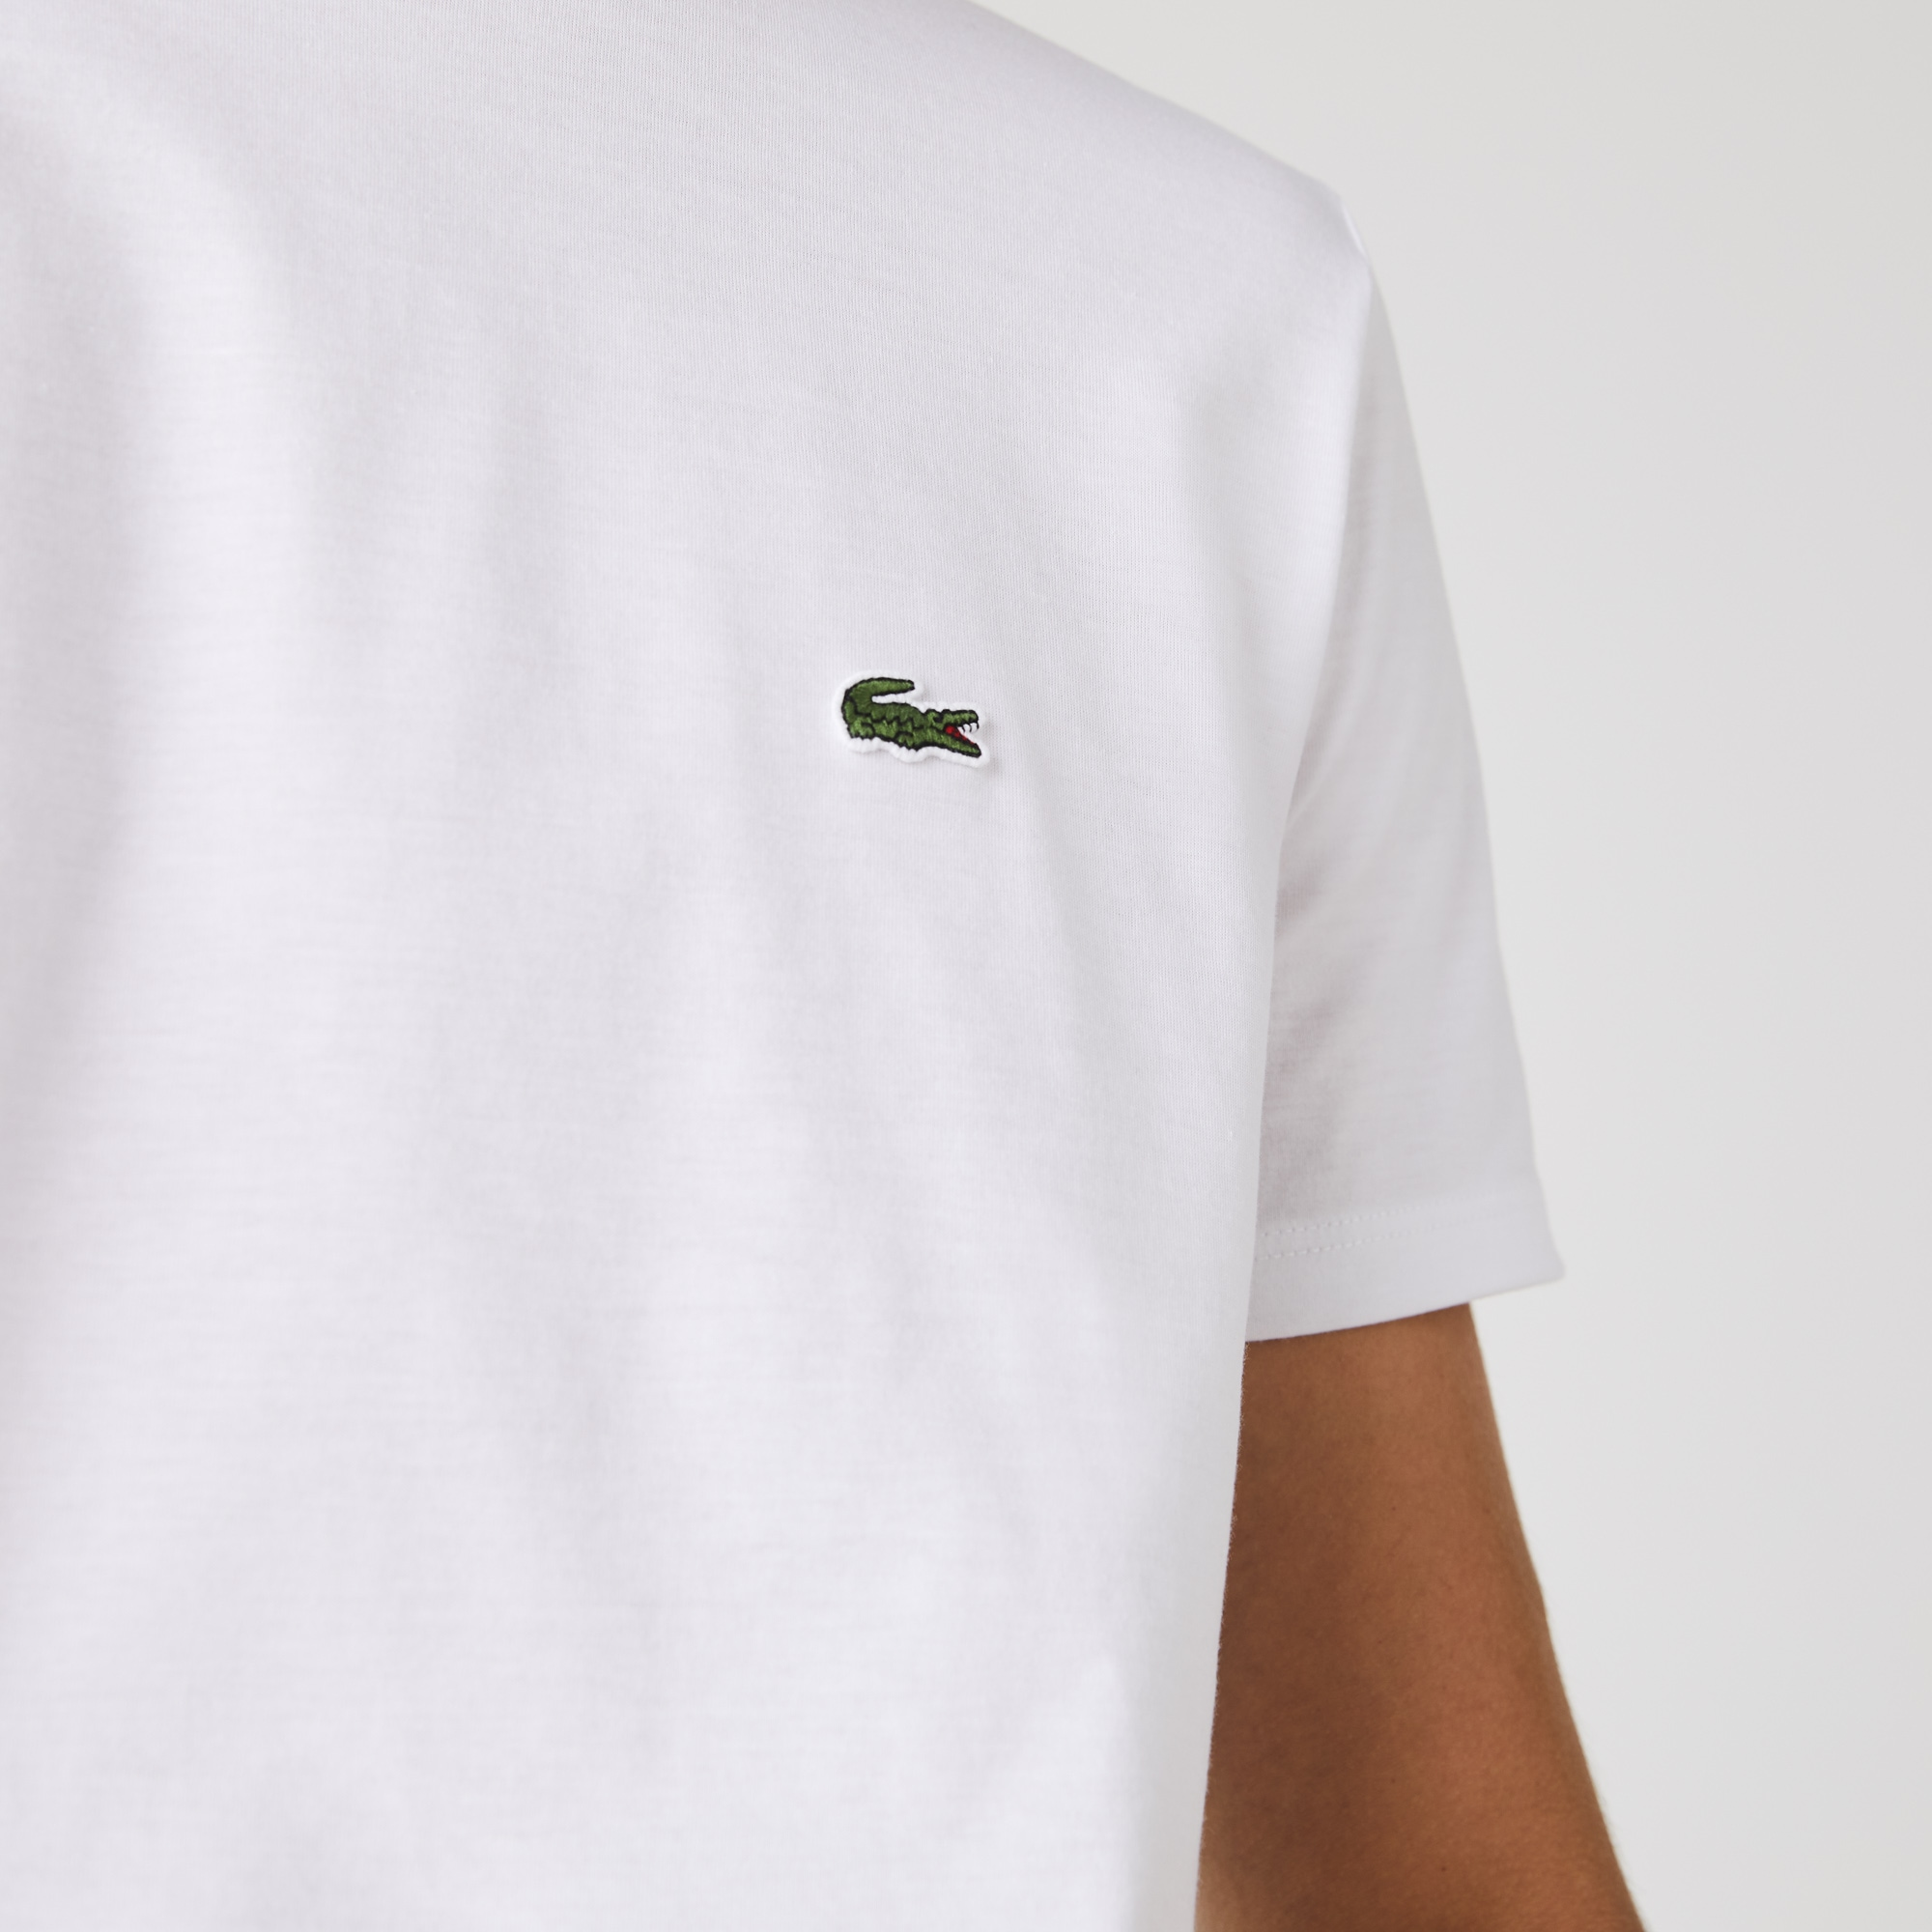 Authentic Lacoste Men/'s TH6709 Pink 100/% Pima Crewneck SS Tee  T-Shirt Shirts